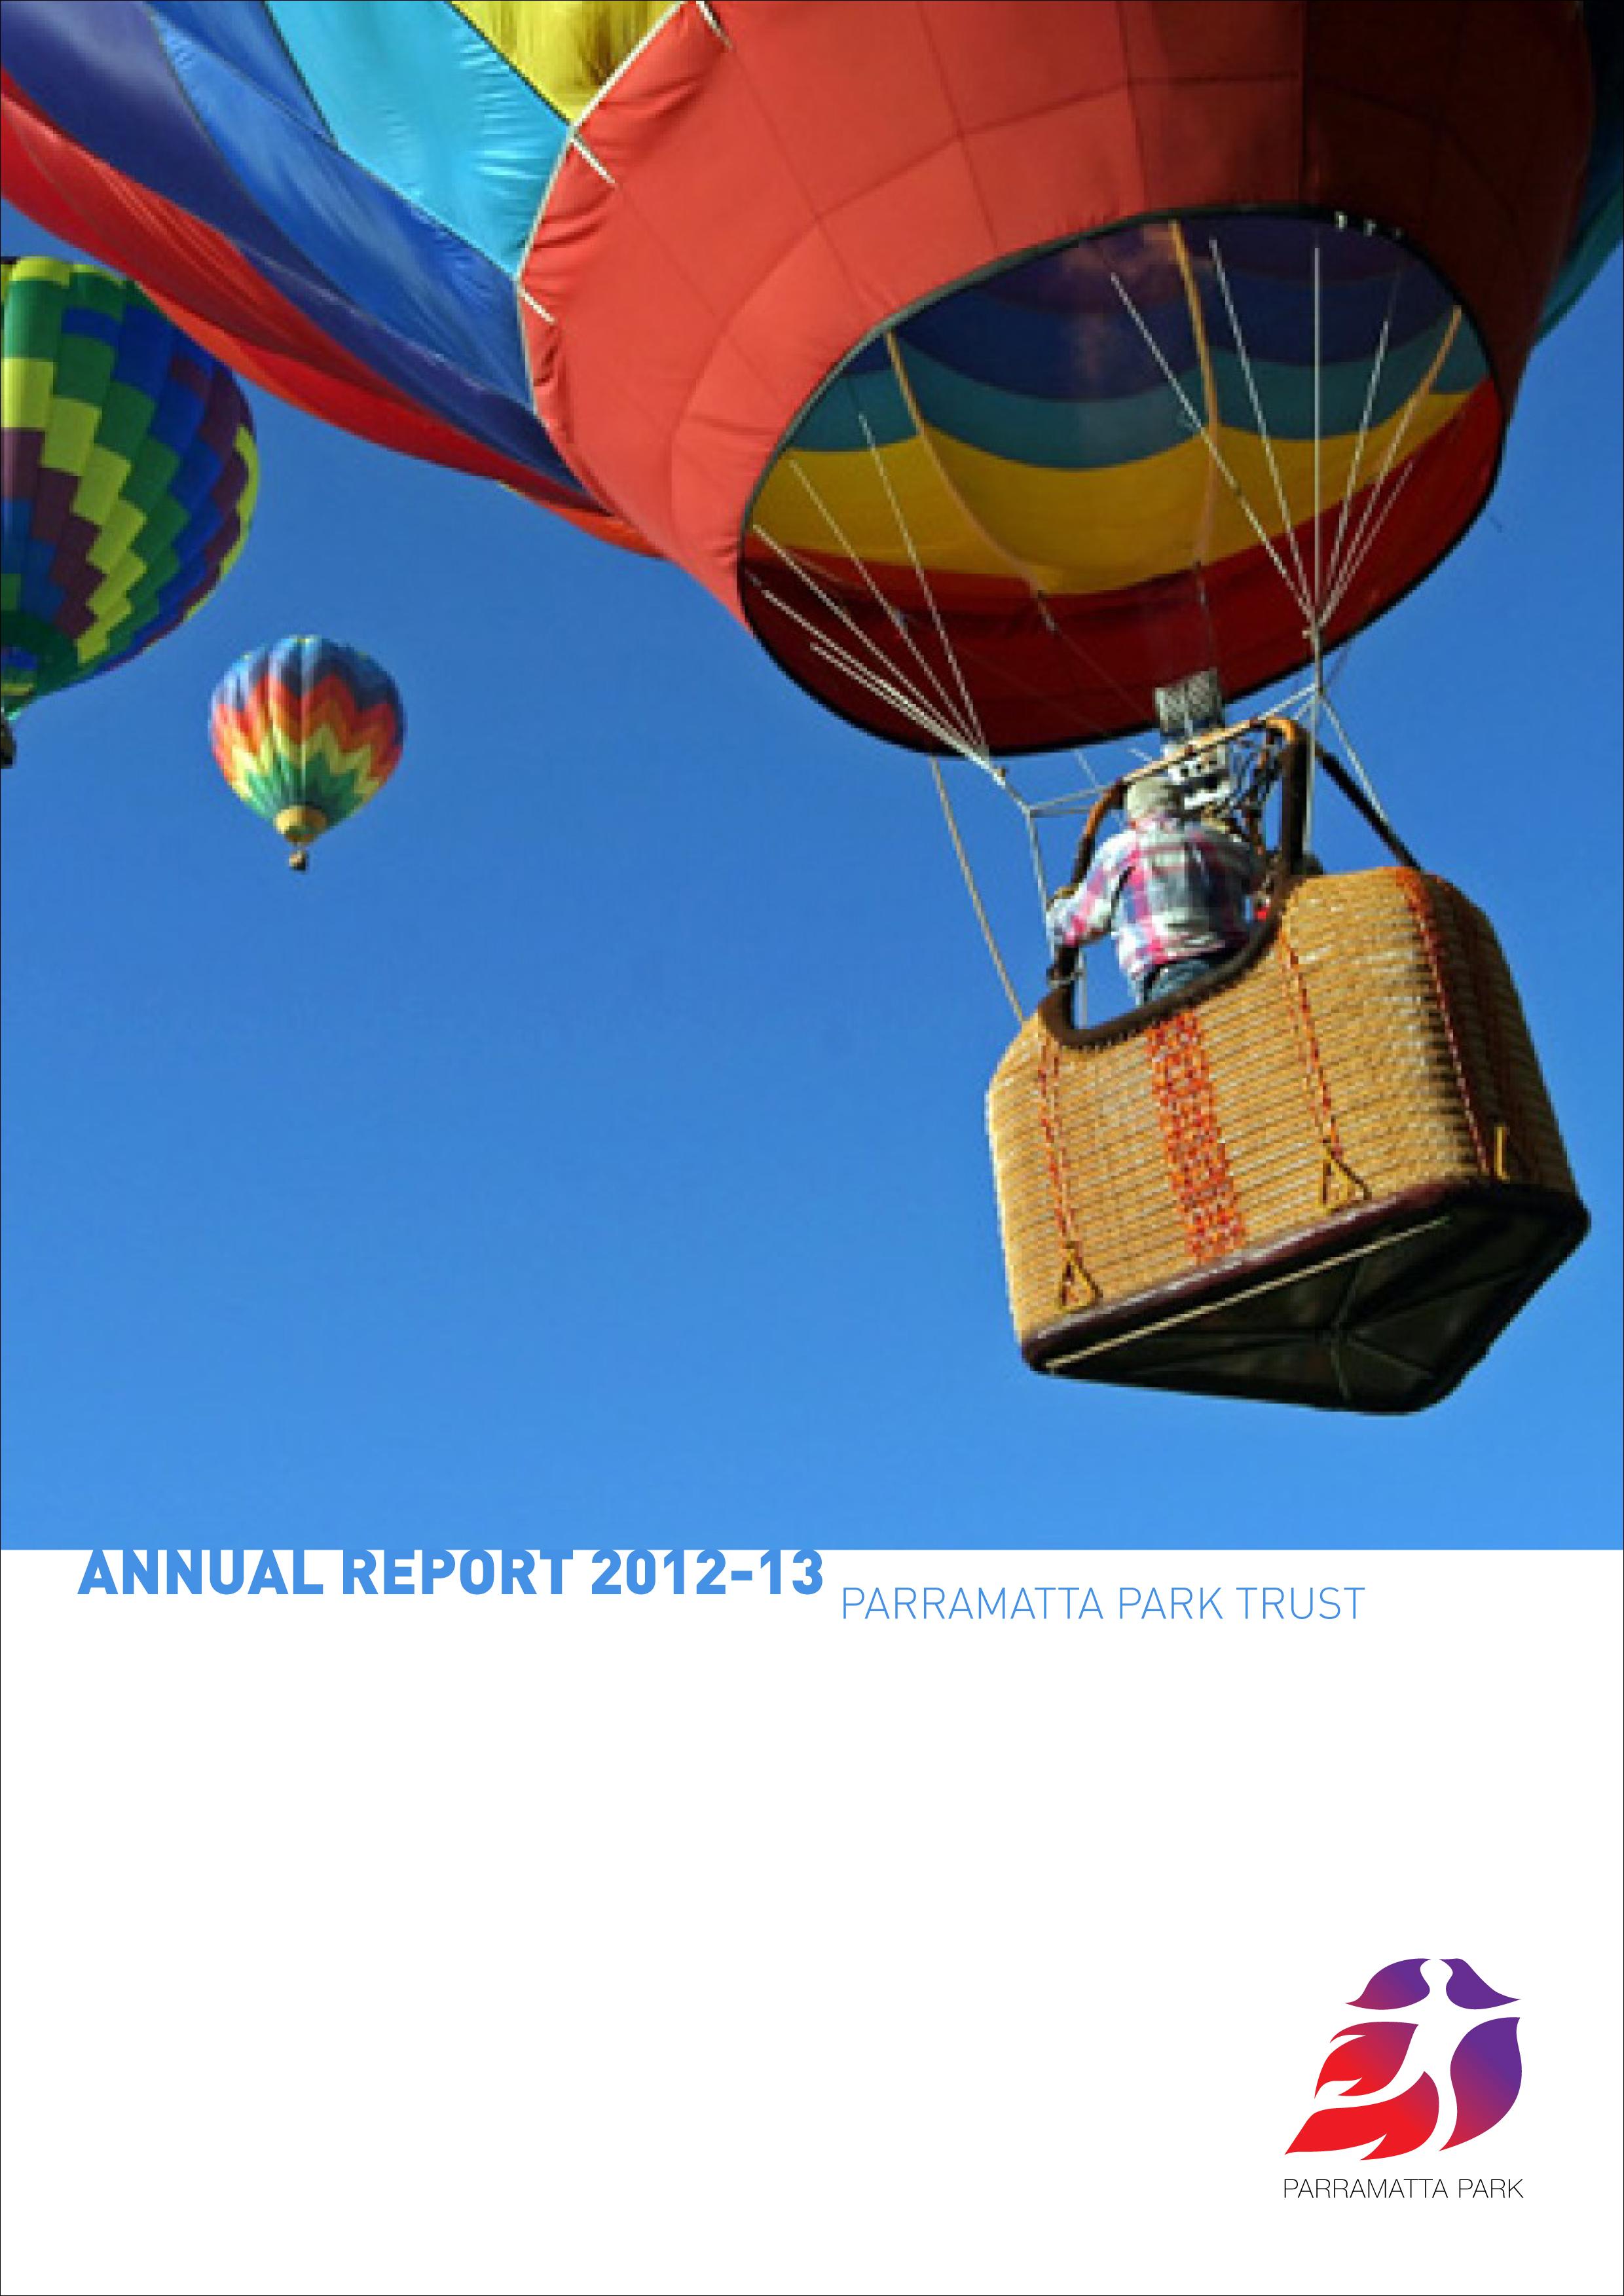 Parramatta Park Annual Report Cover